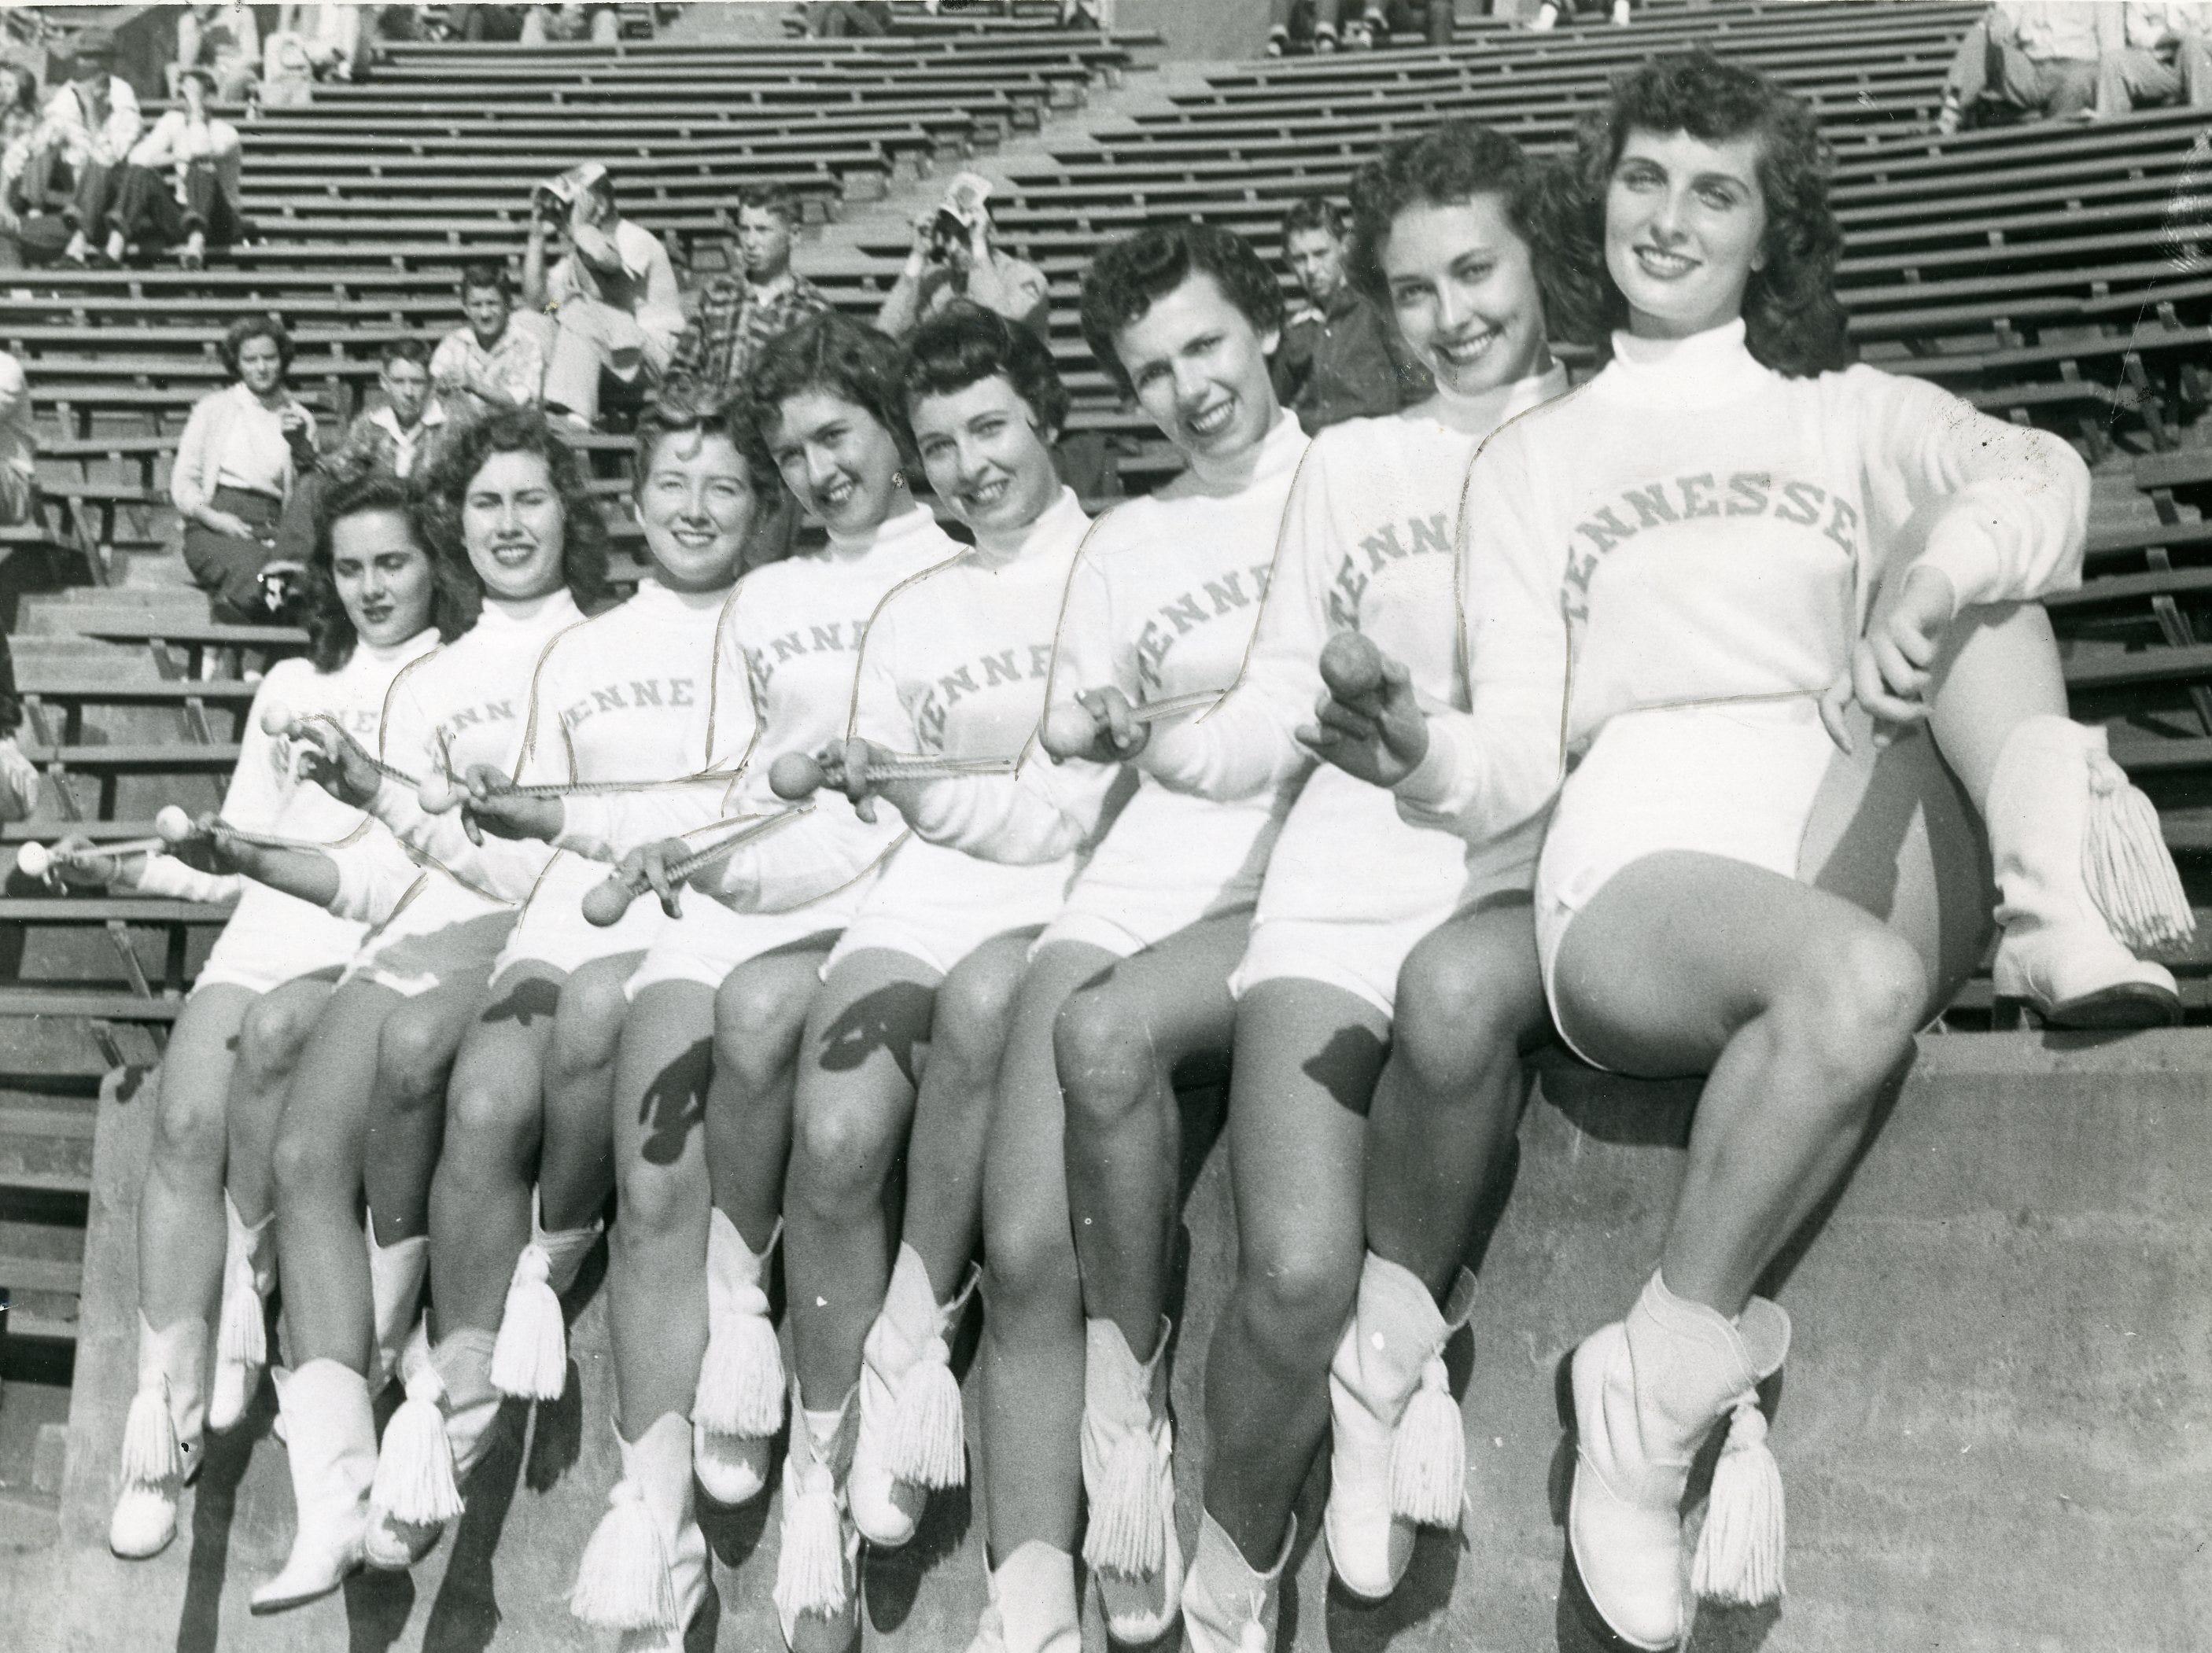 The 1954 UT majorettes included (from left) Bobbie Bird, Ernestine Freeman, Judy Lillard, Anne Dale Guinn, Mary Lee Thomas, Dorothy Faye Brown, Betty Shanton and Anne Thompson.